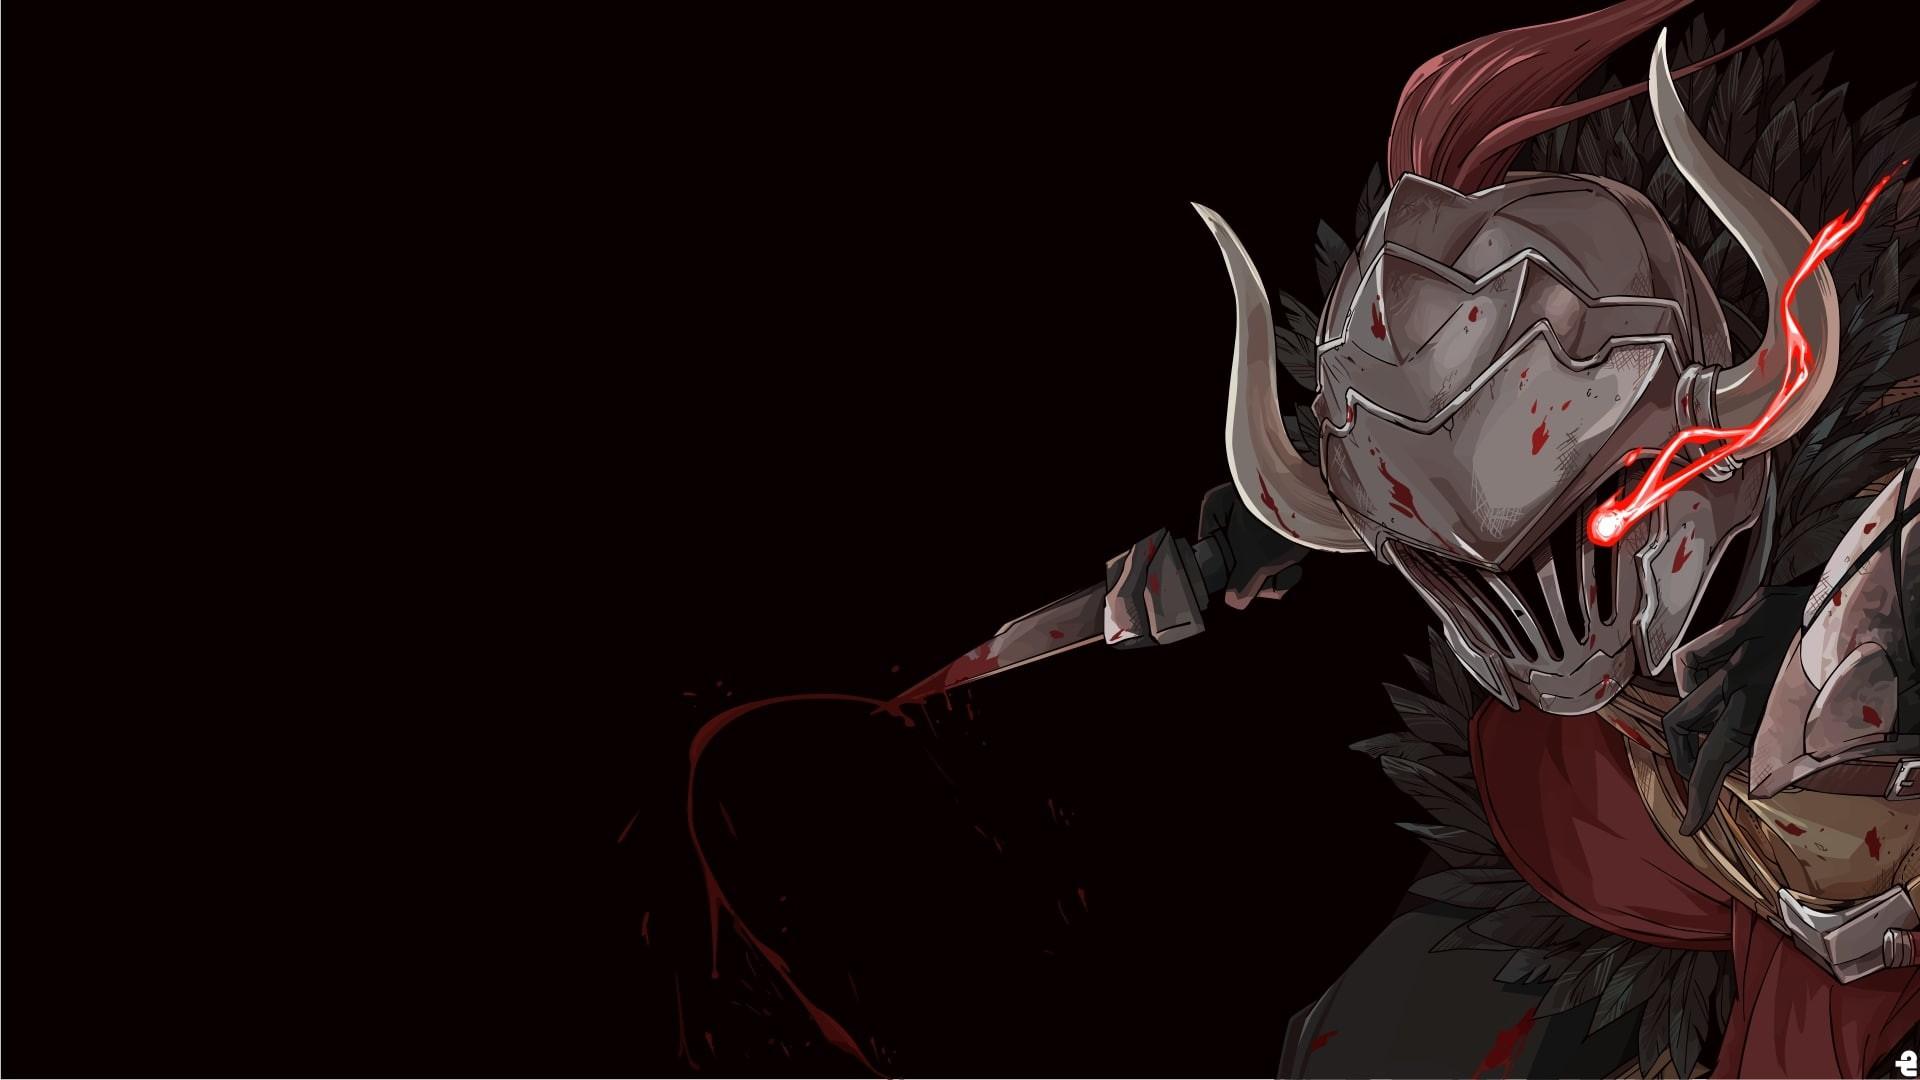 Anime Wallpaper 1920x1080 Demon Slayer